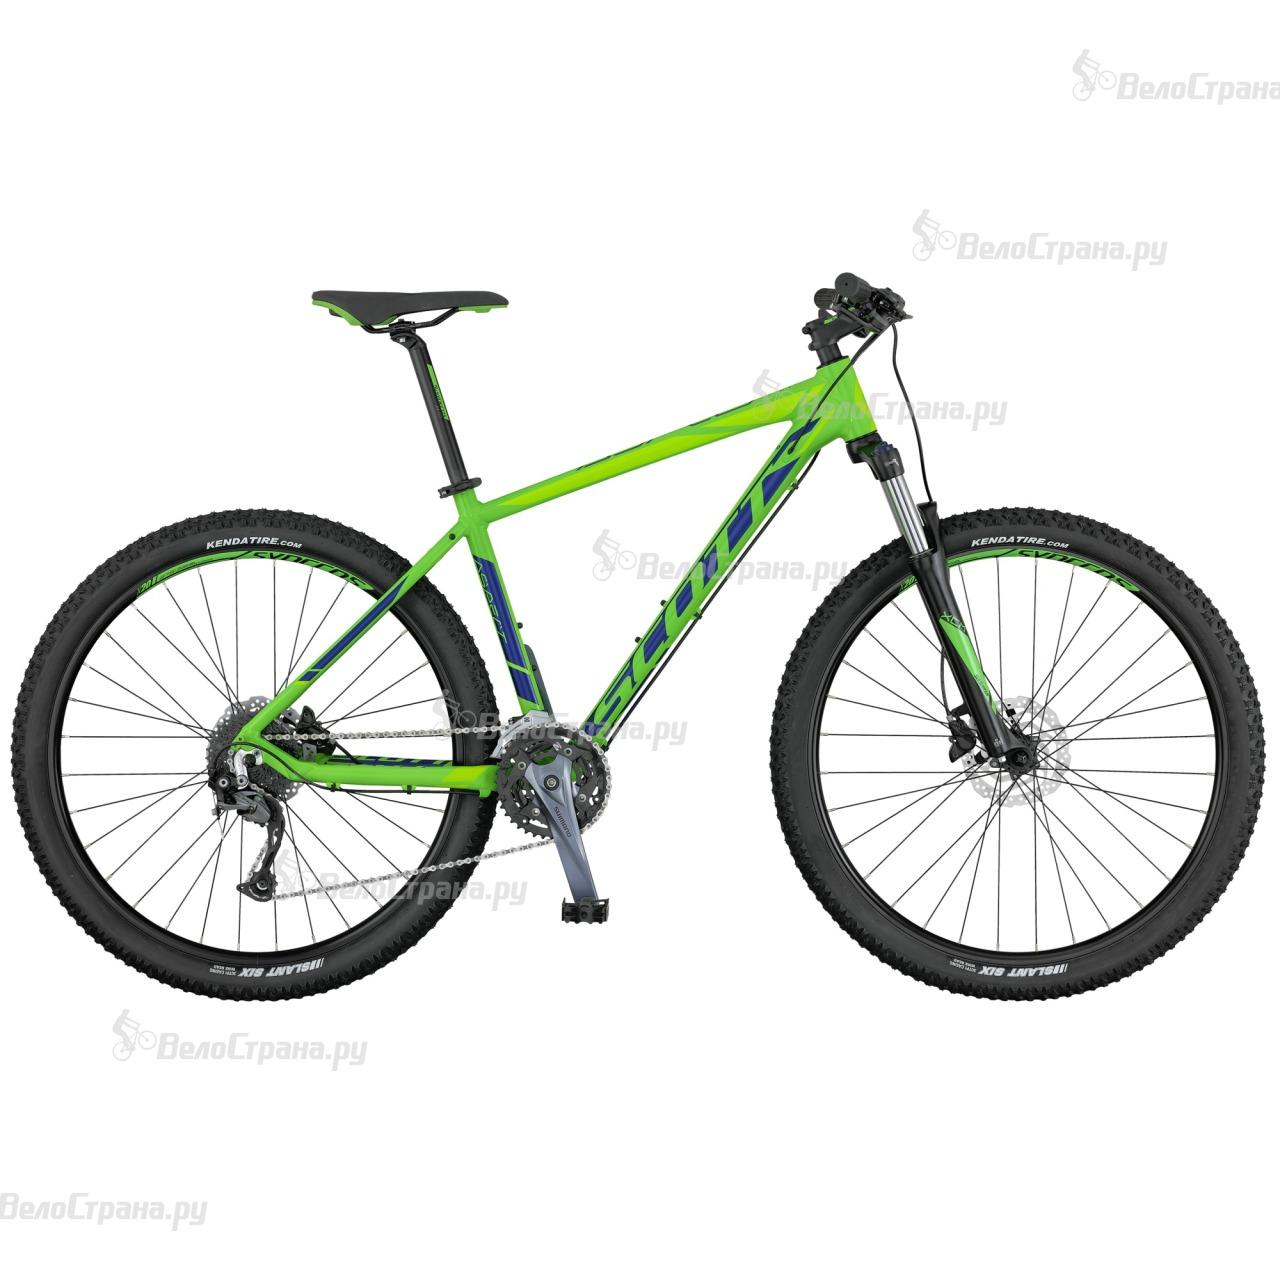 Велосипед Scott Aspect 740 (2017) велосипед scott aspect 700 27 5 2016